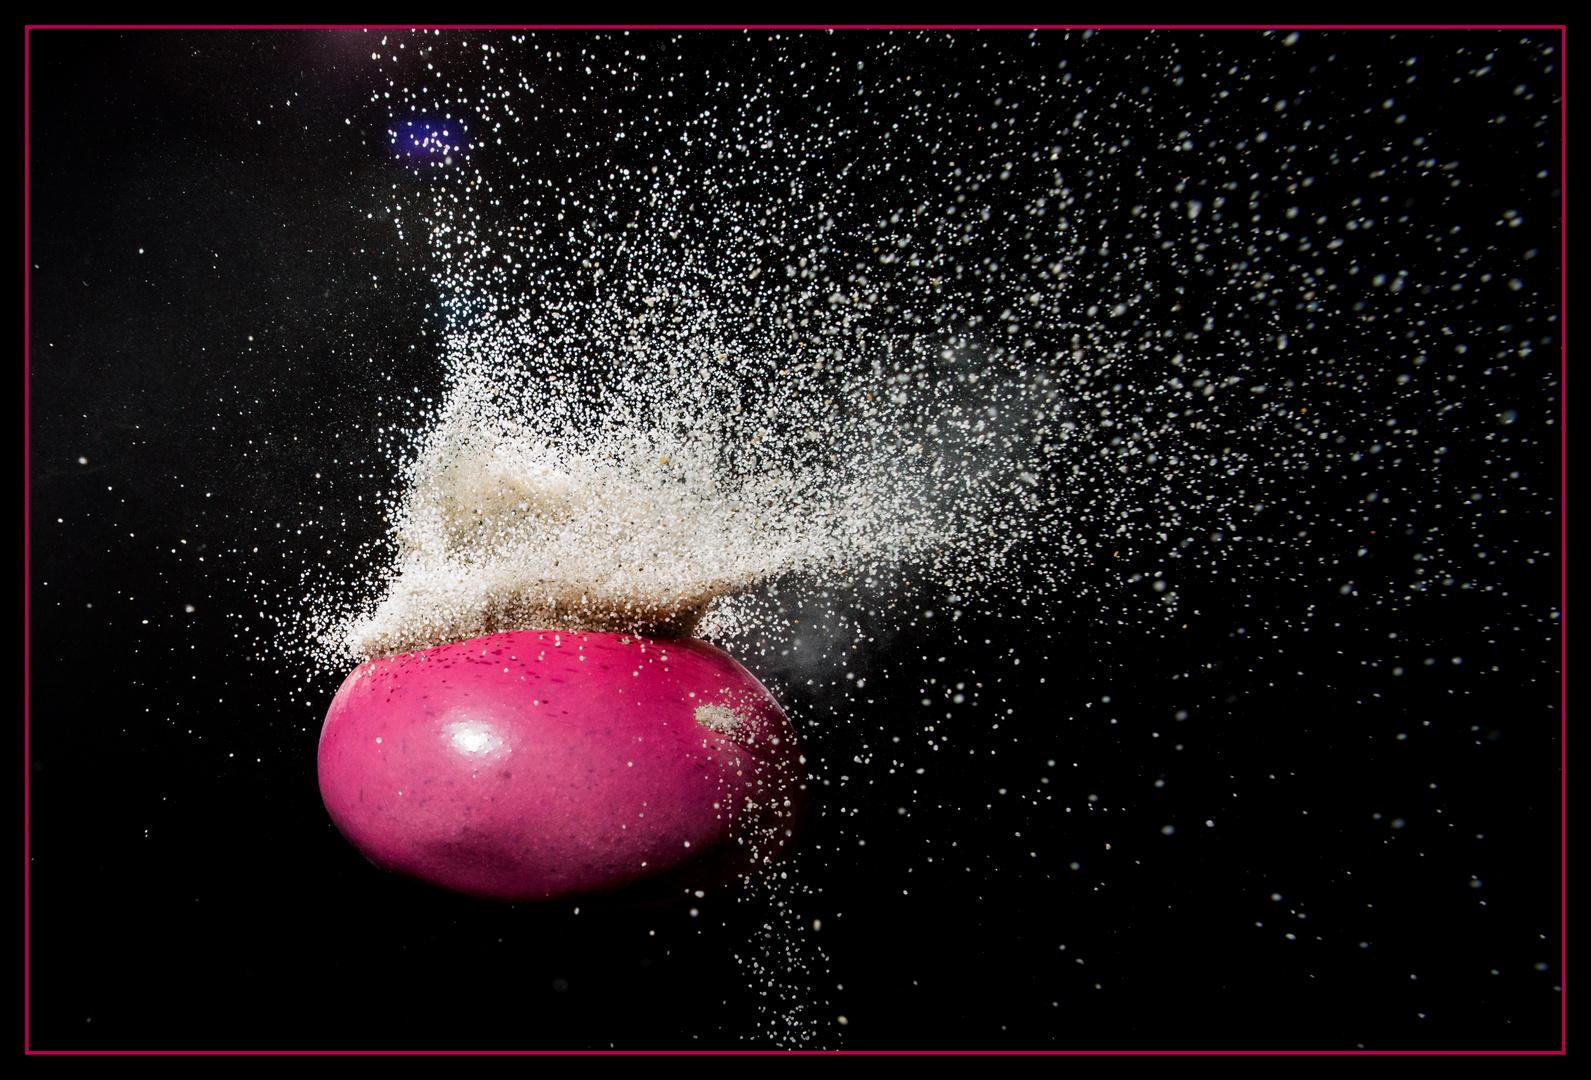 Sand im Ballon 06